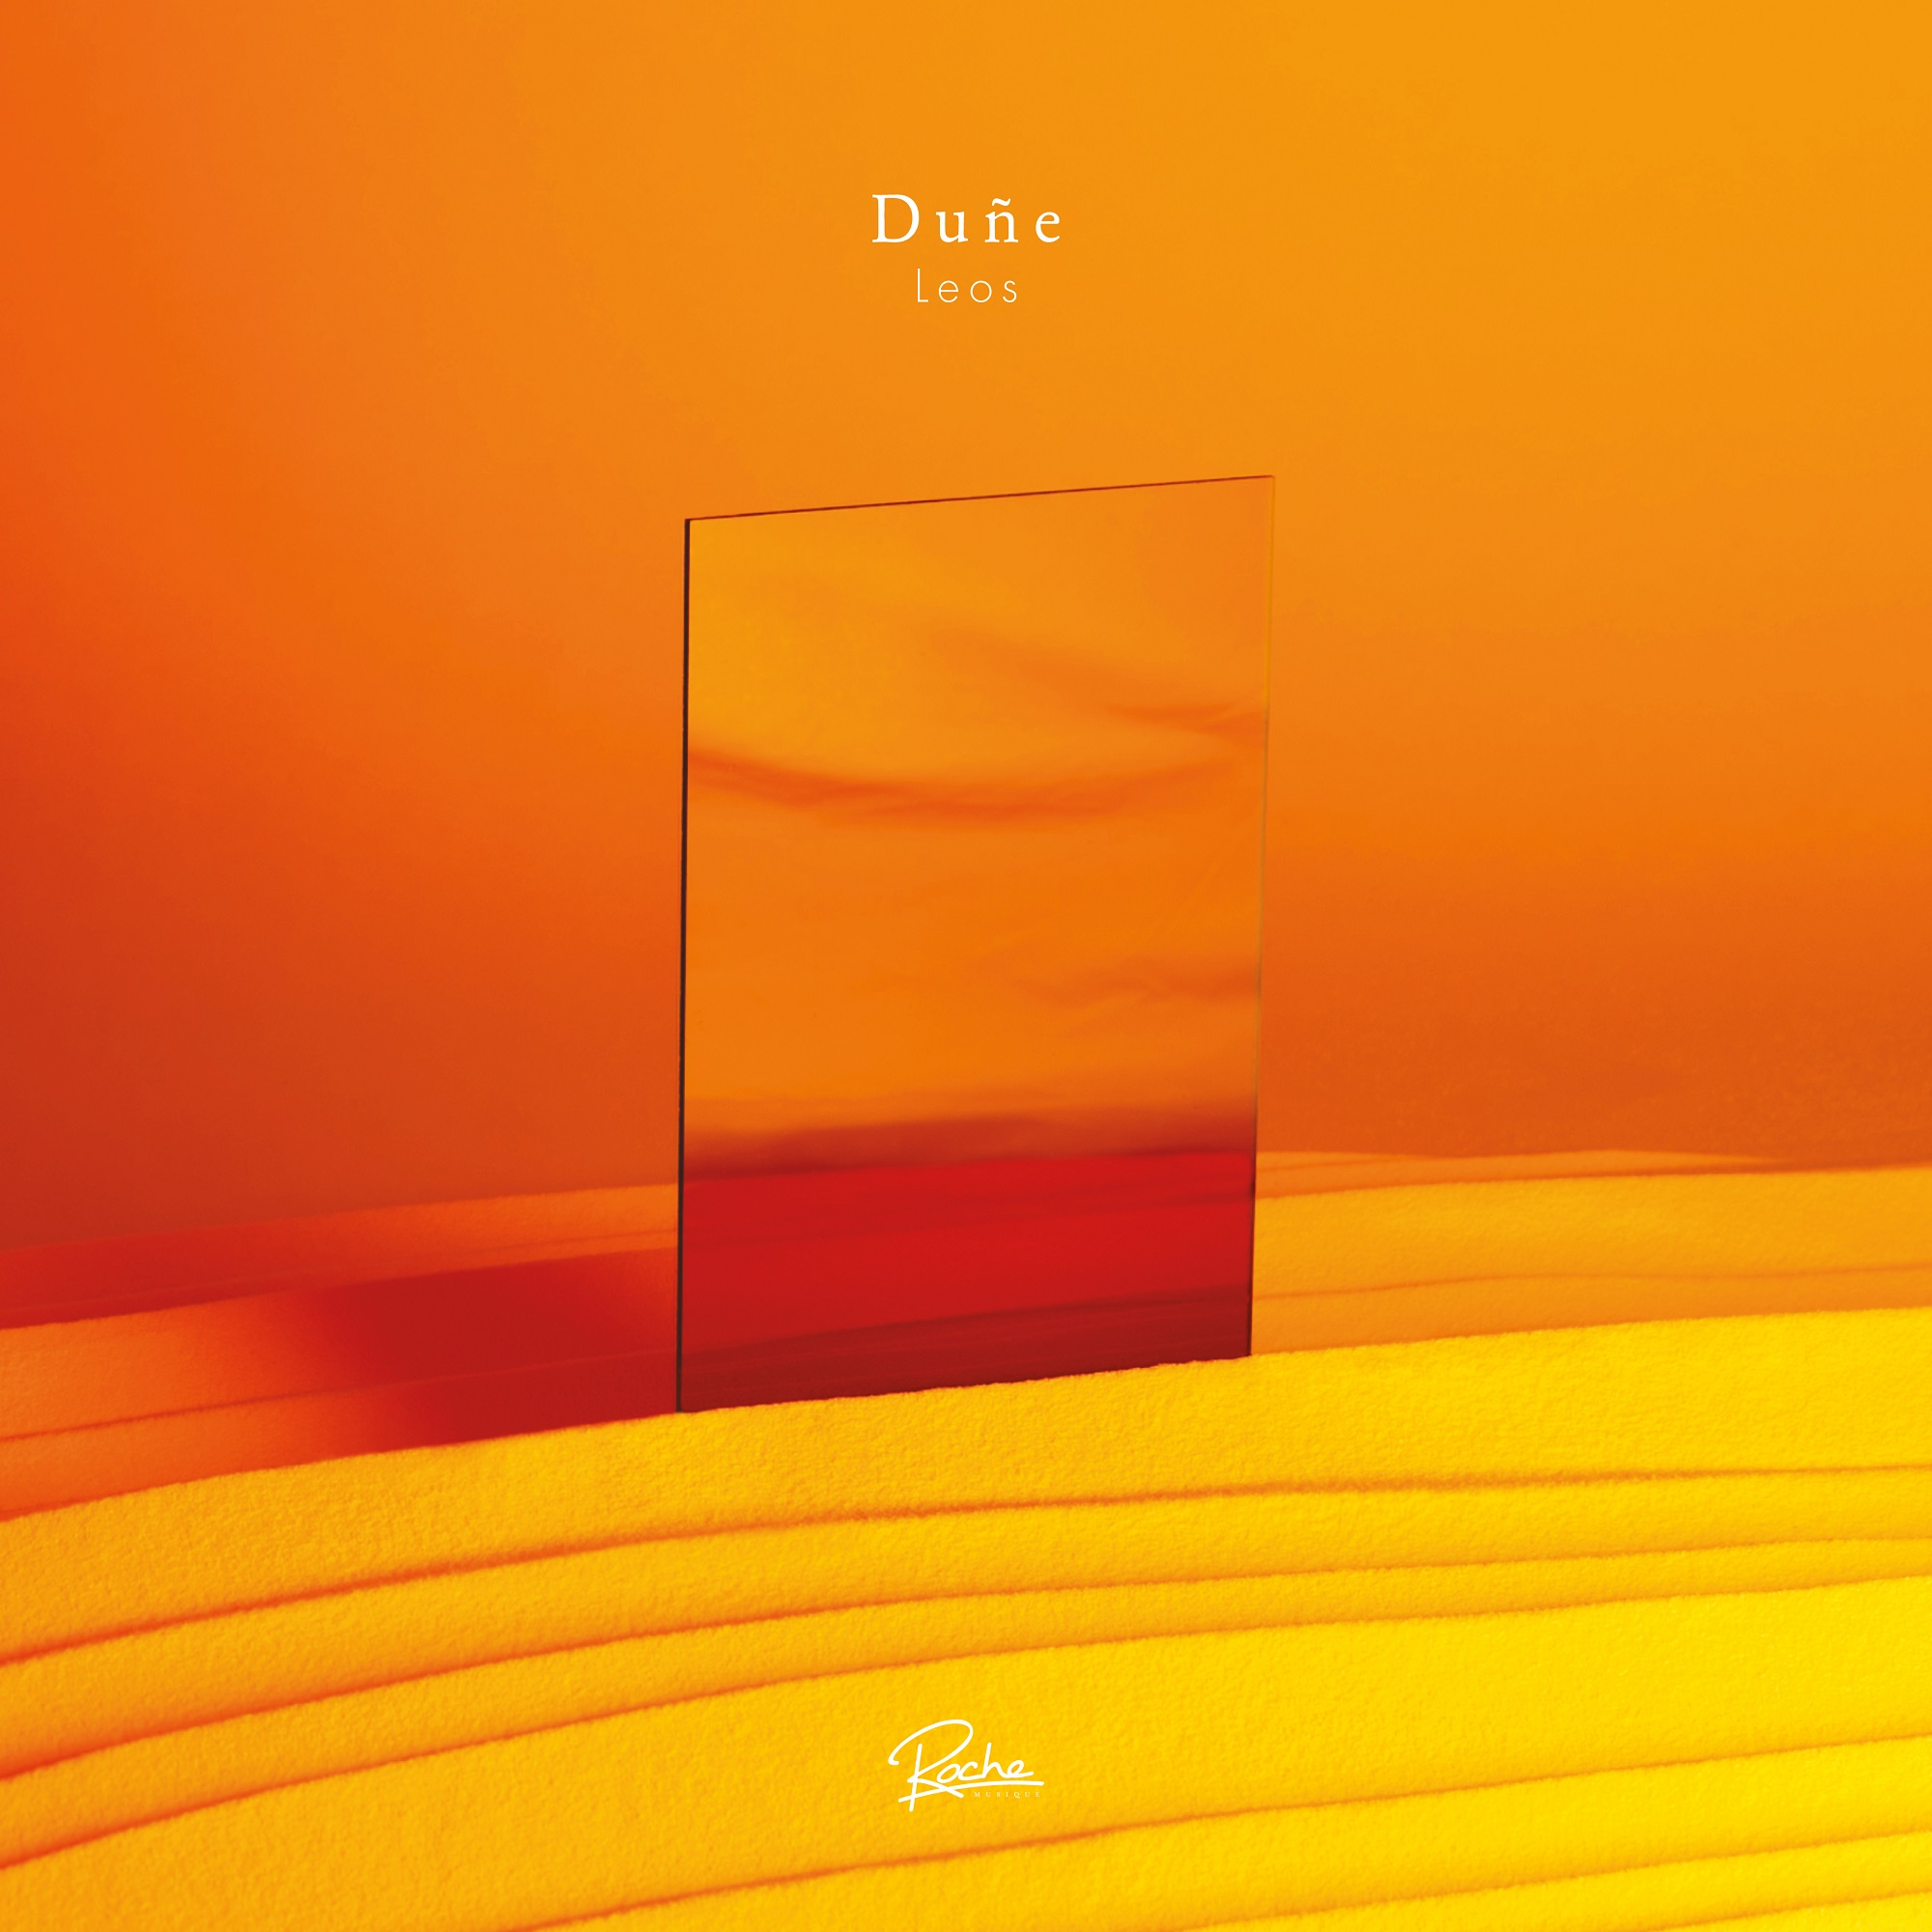 dune-leos-roche-musique-modzik